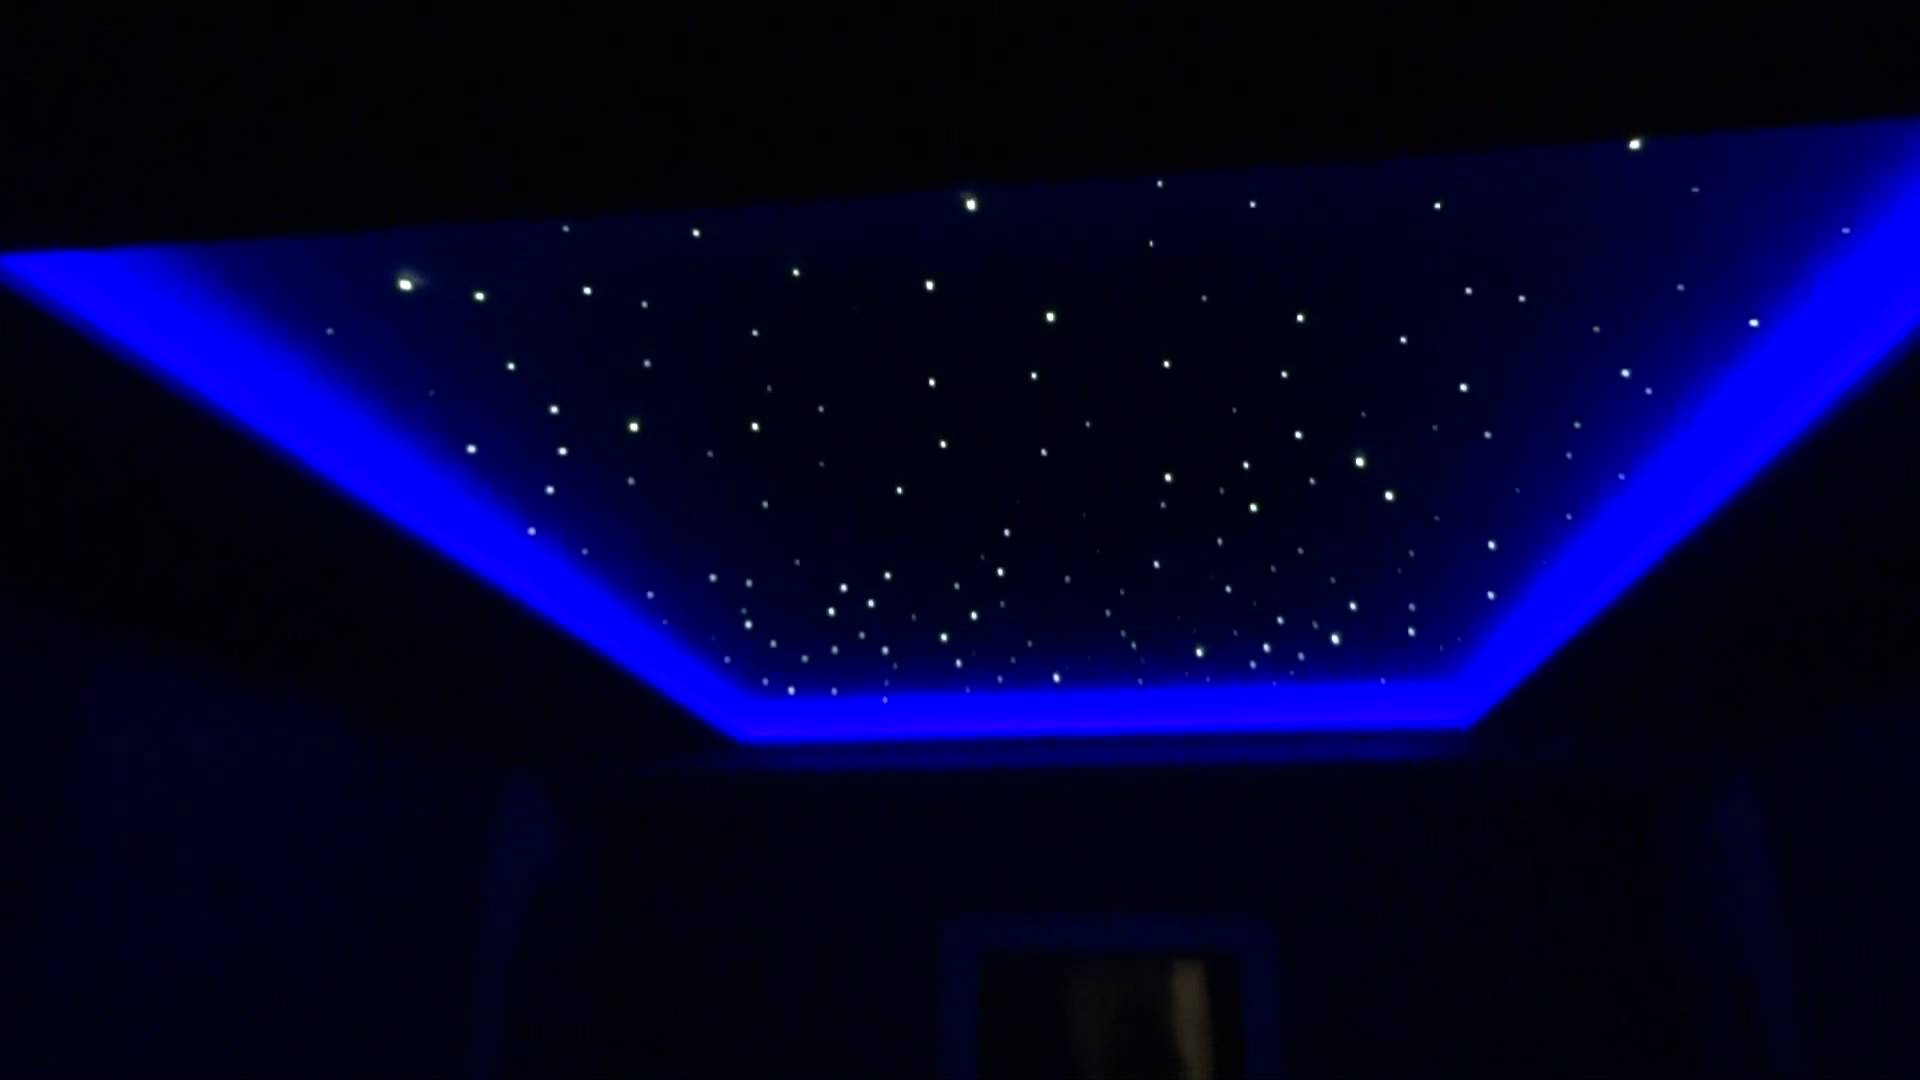 потолок - звездное небо